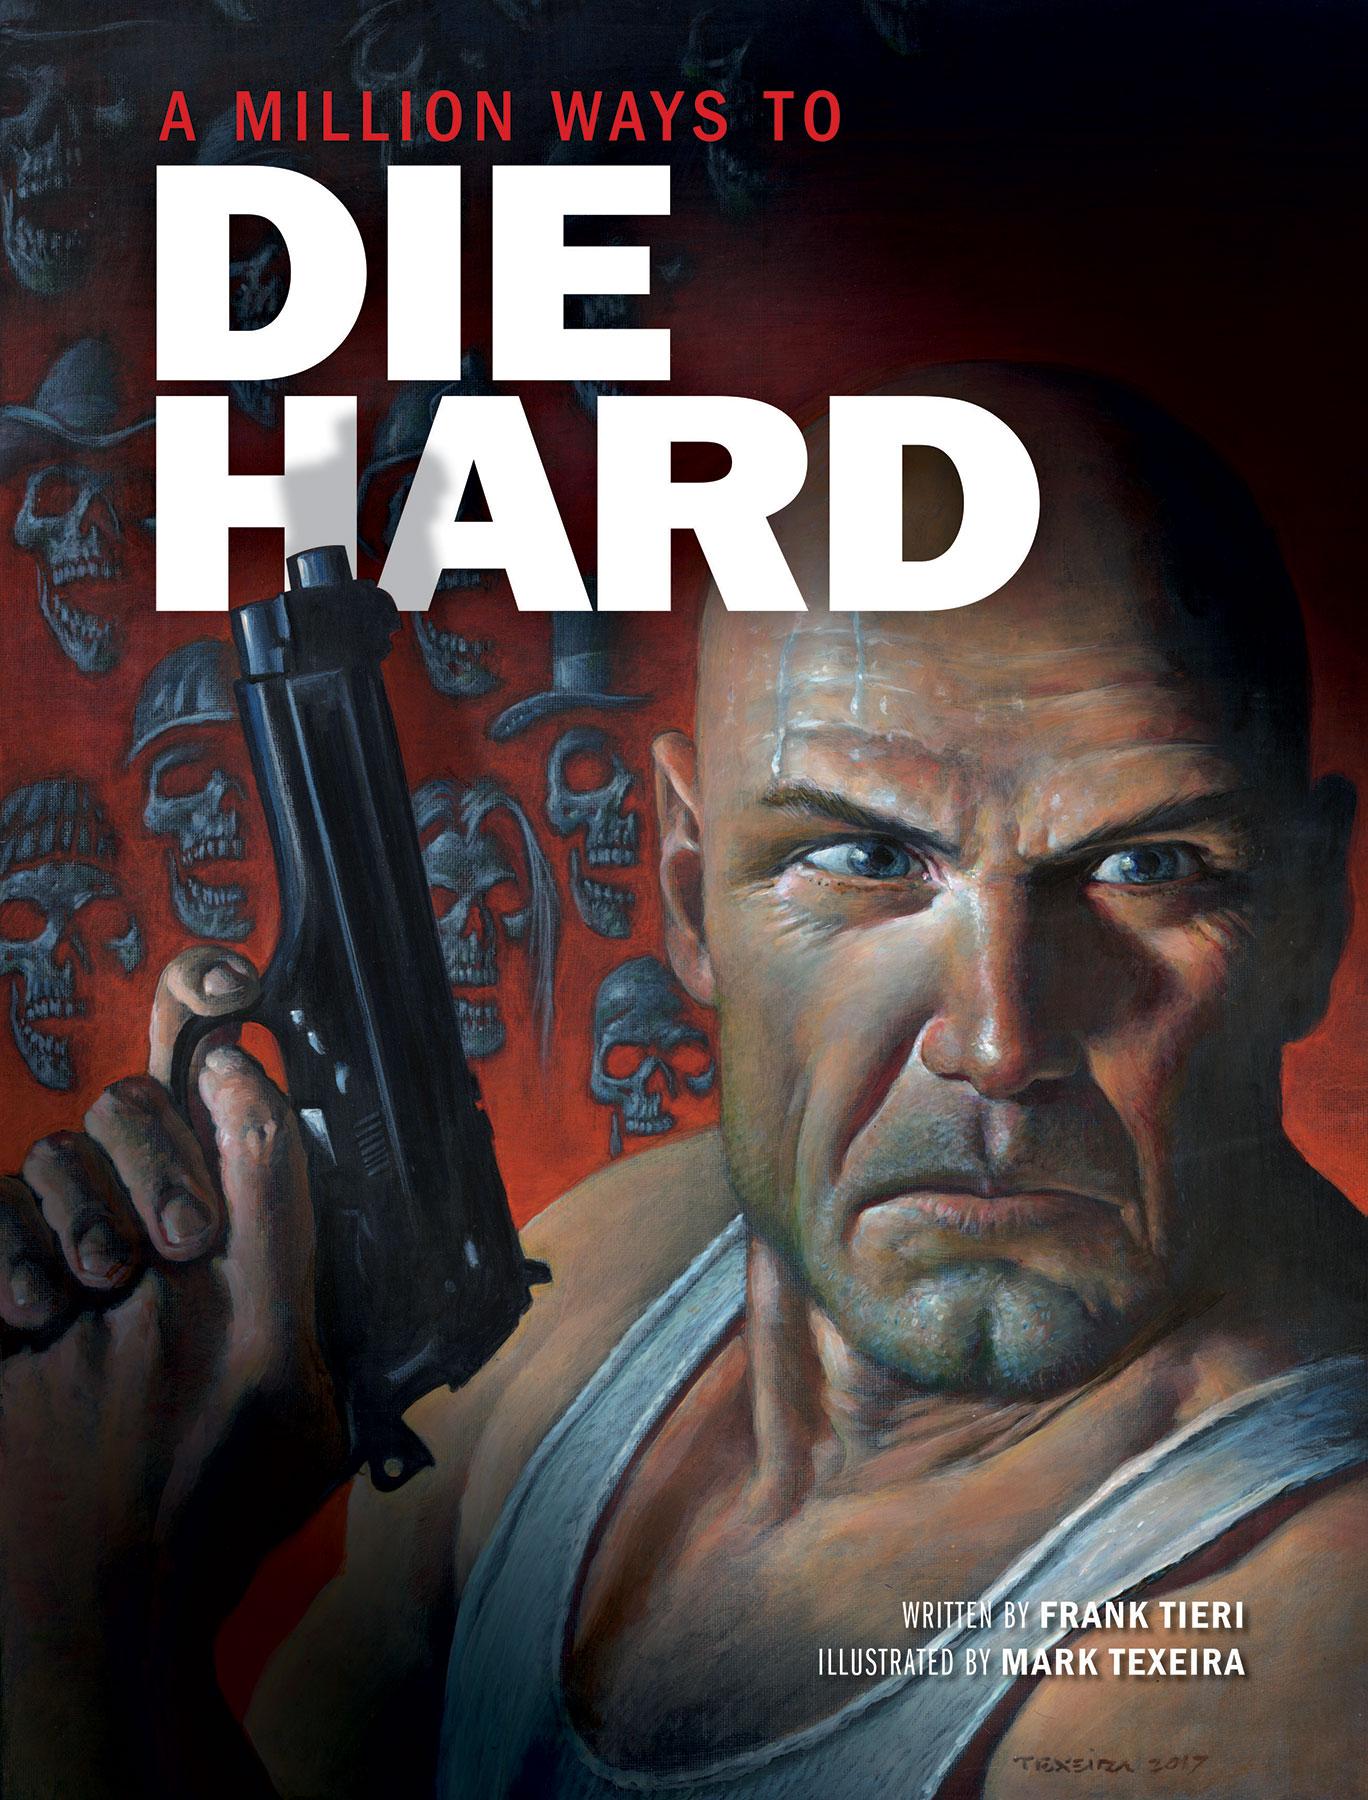 Die Hard giftsA Million Ways to Die Hard (Insight)